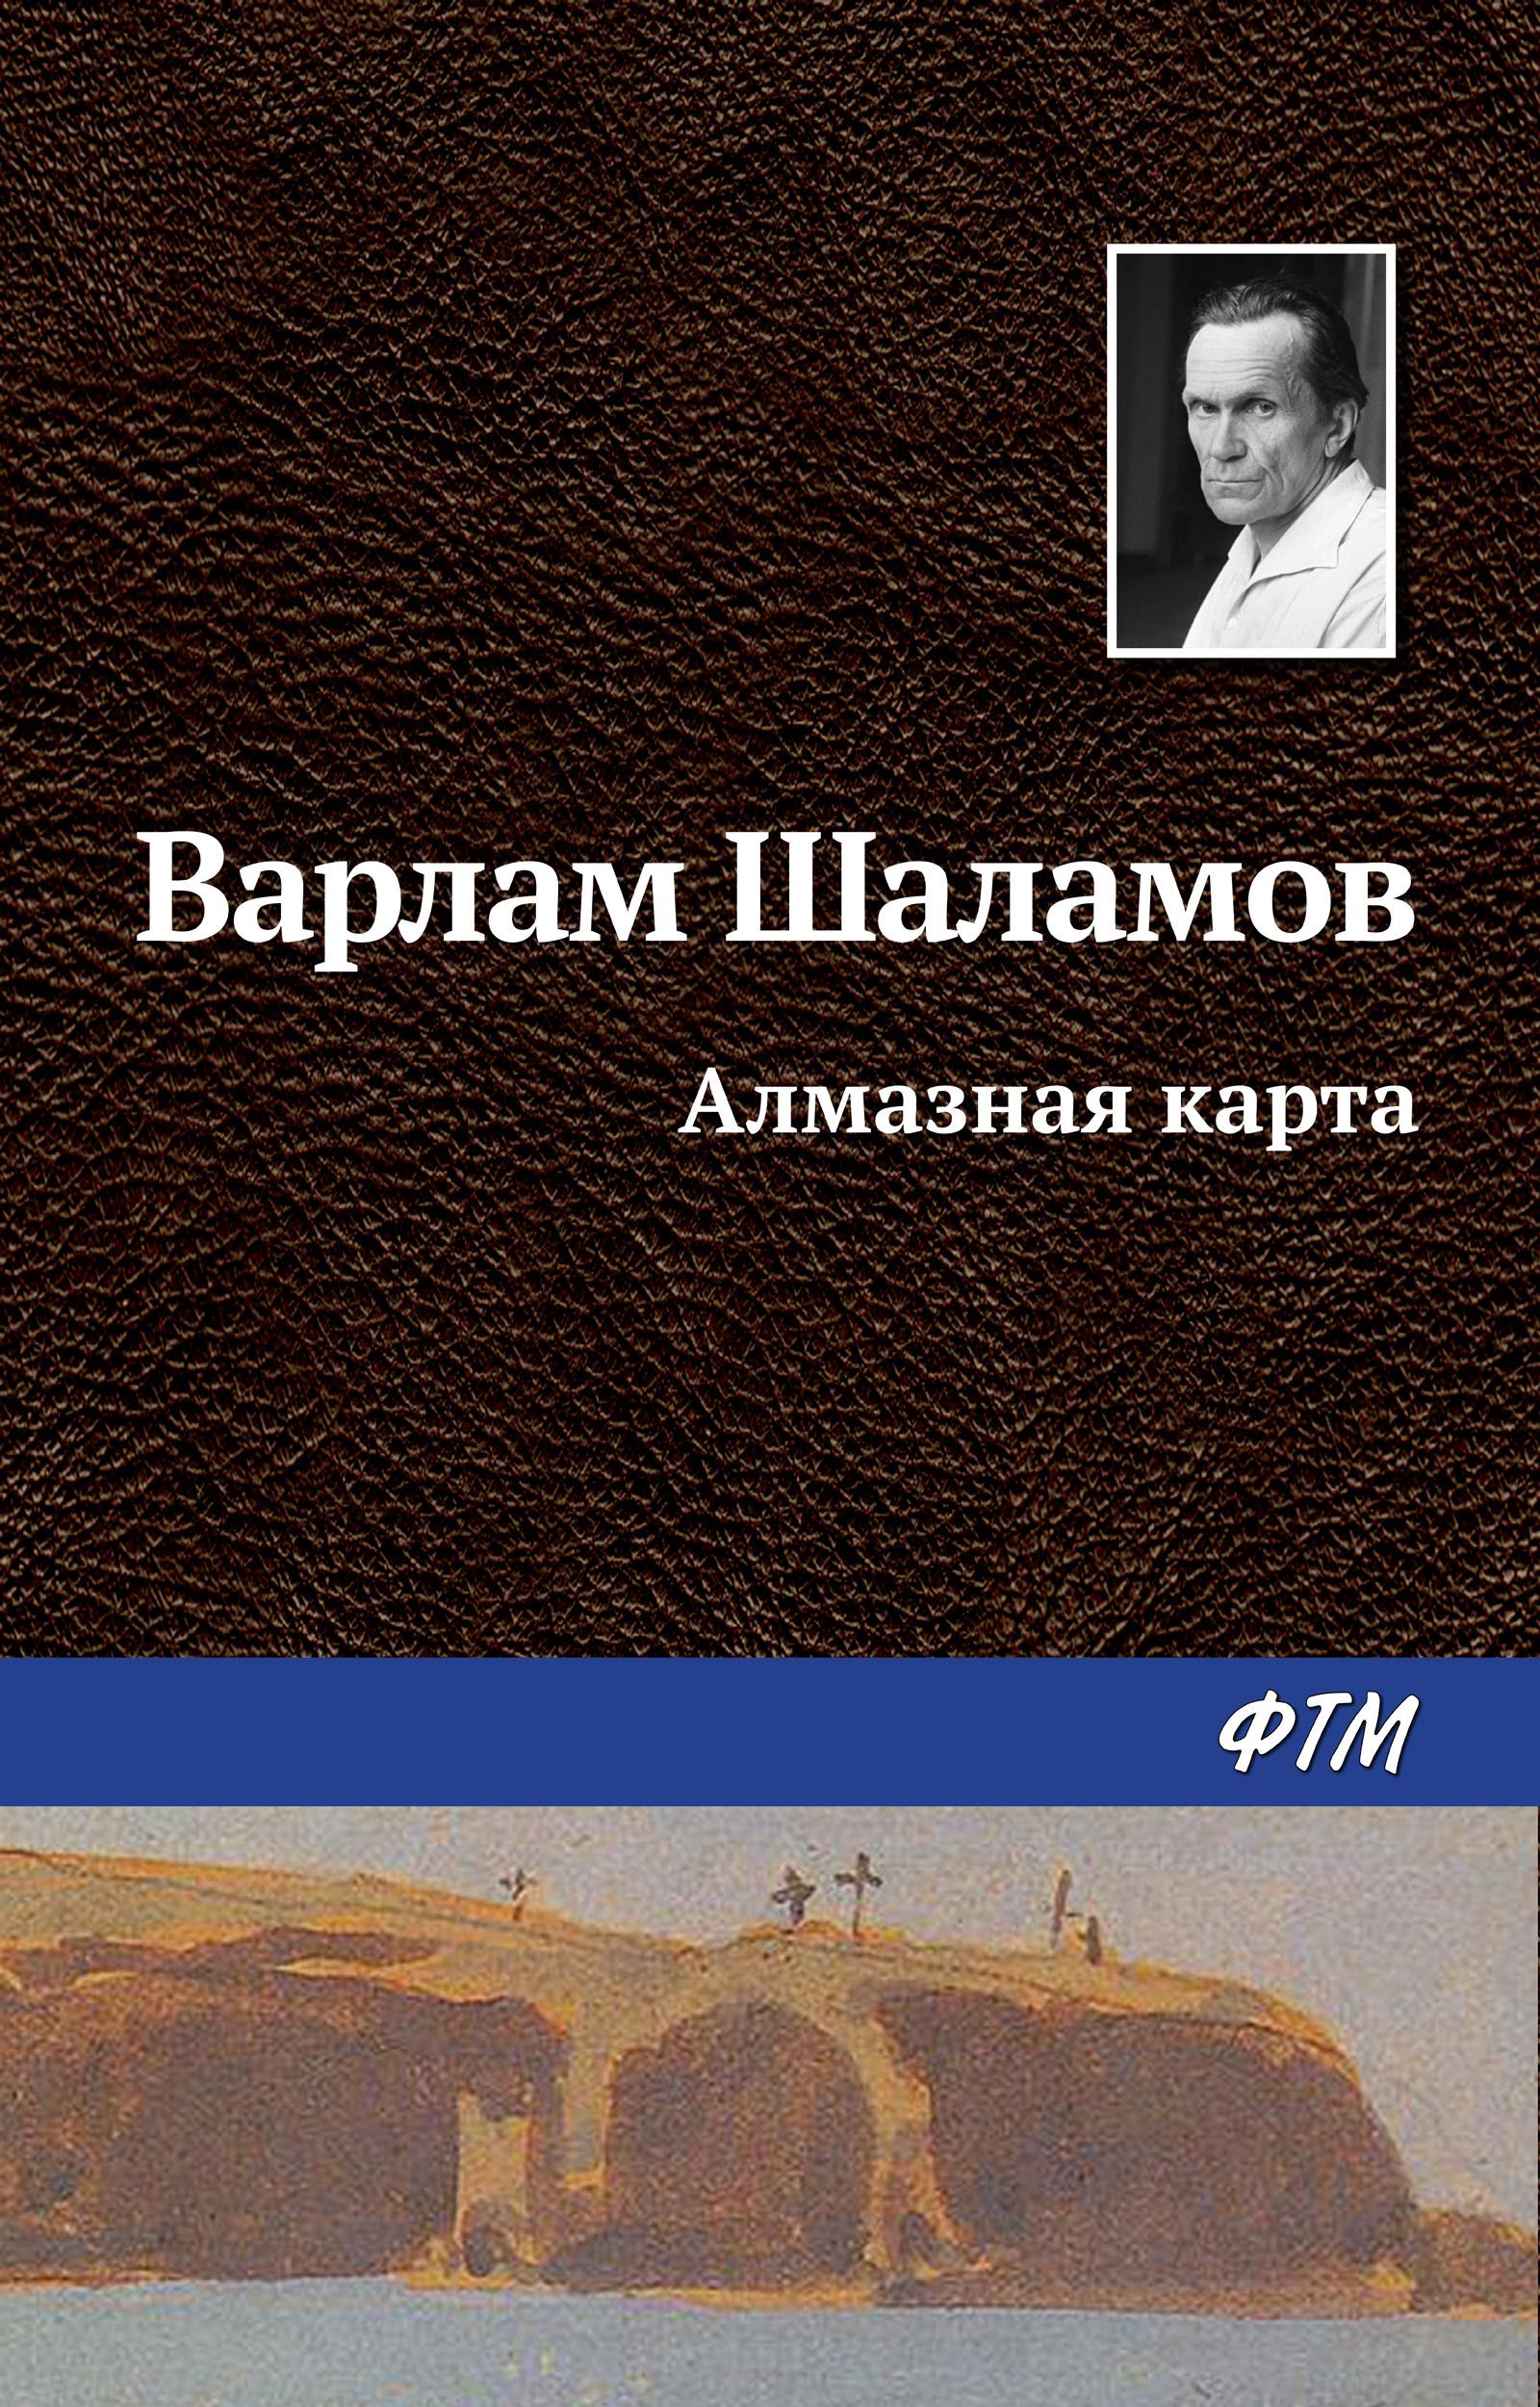 Варлам Шаламов Алмазная карта